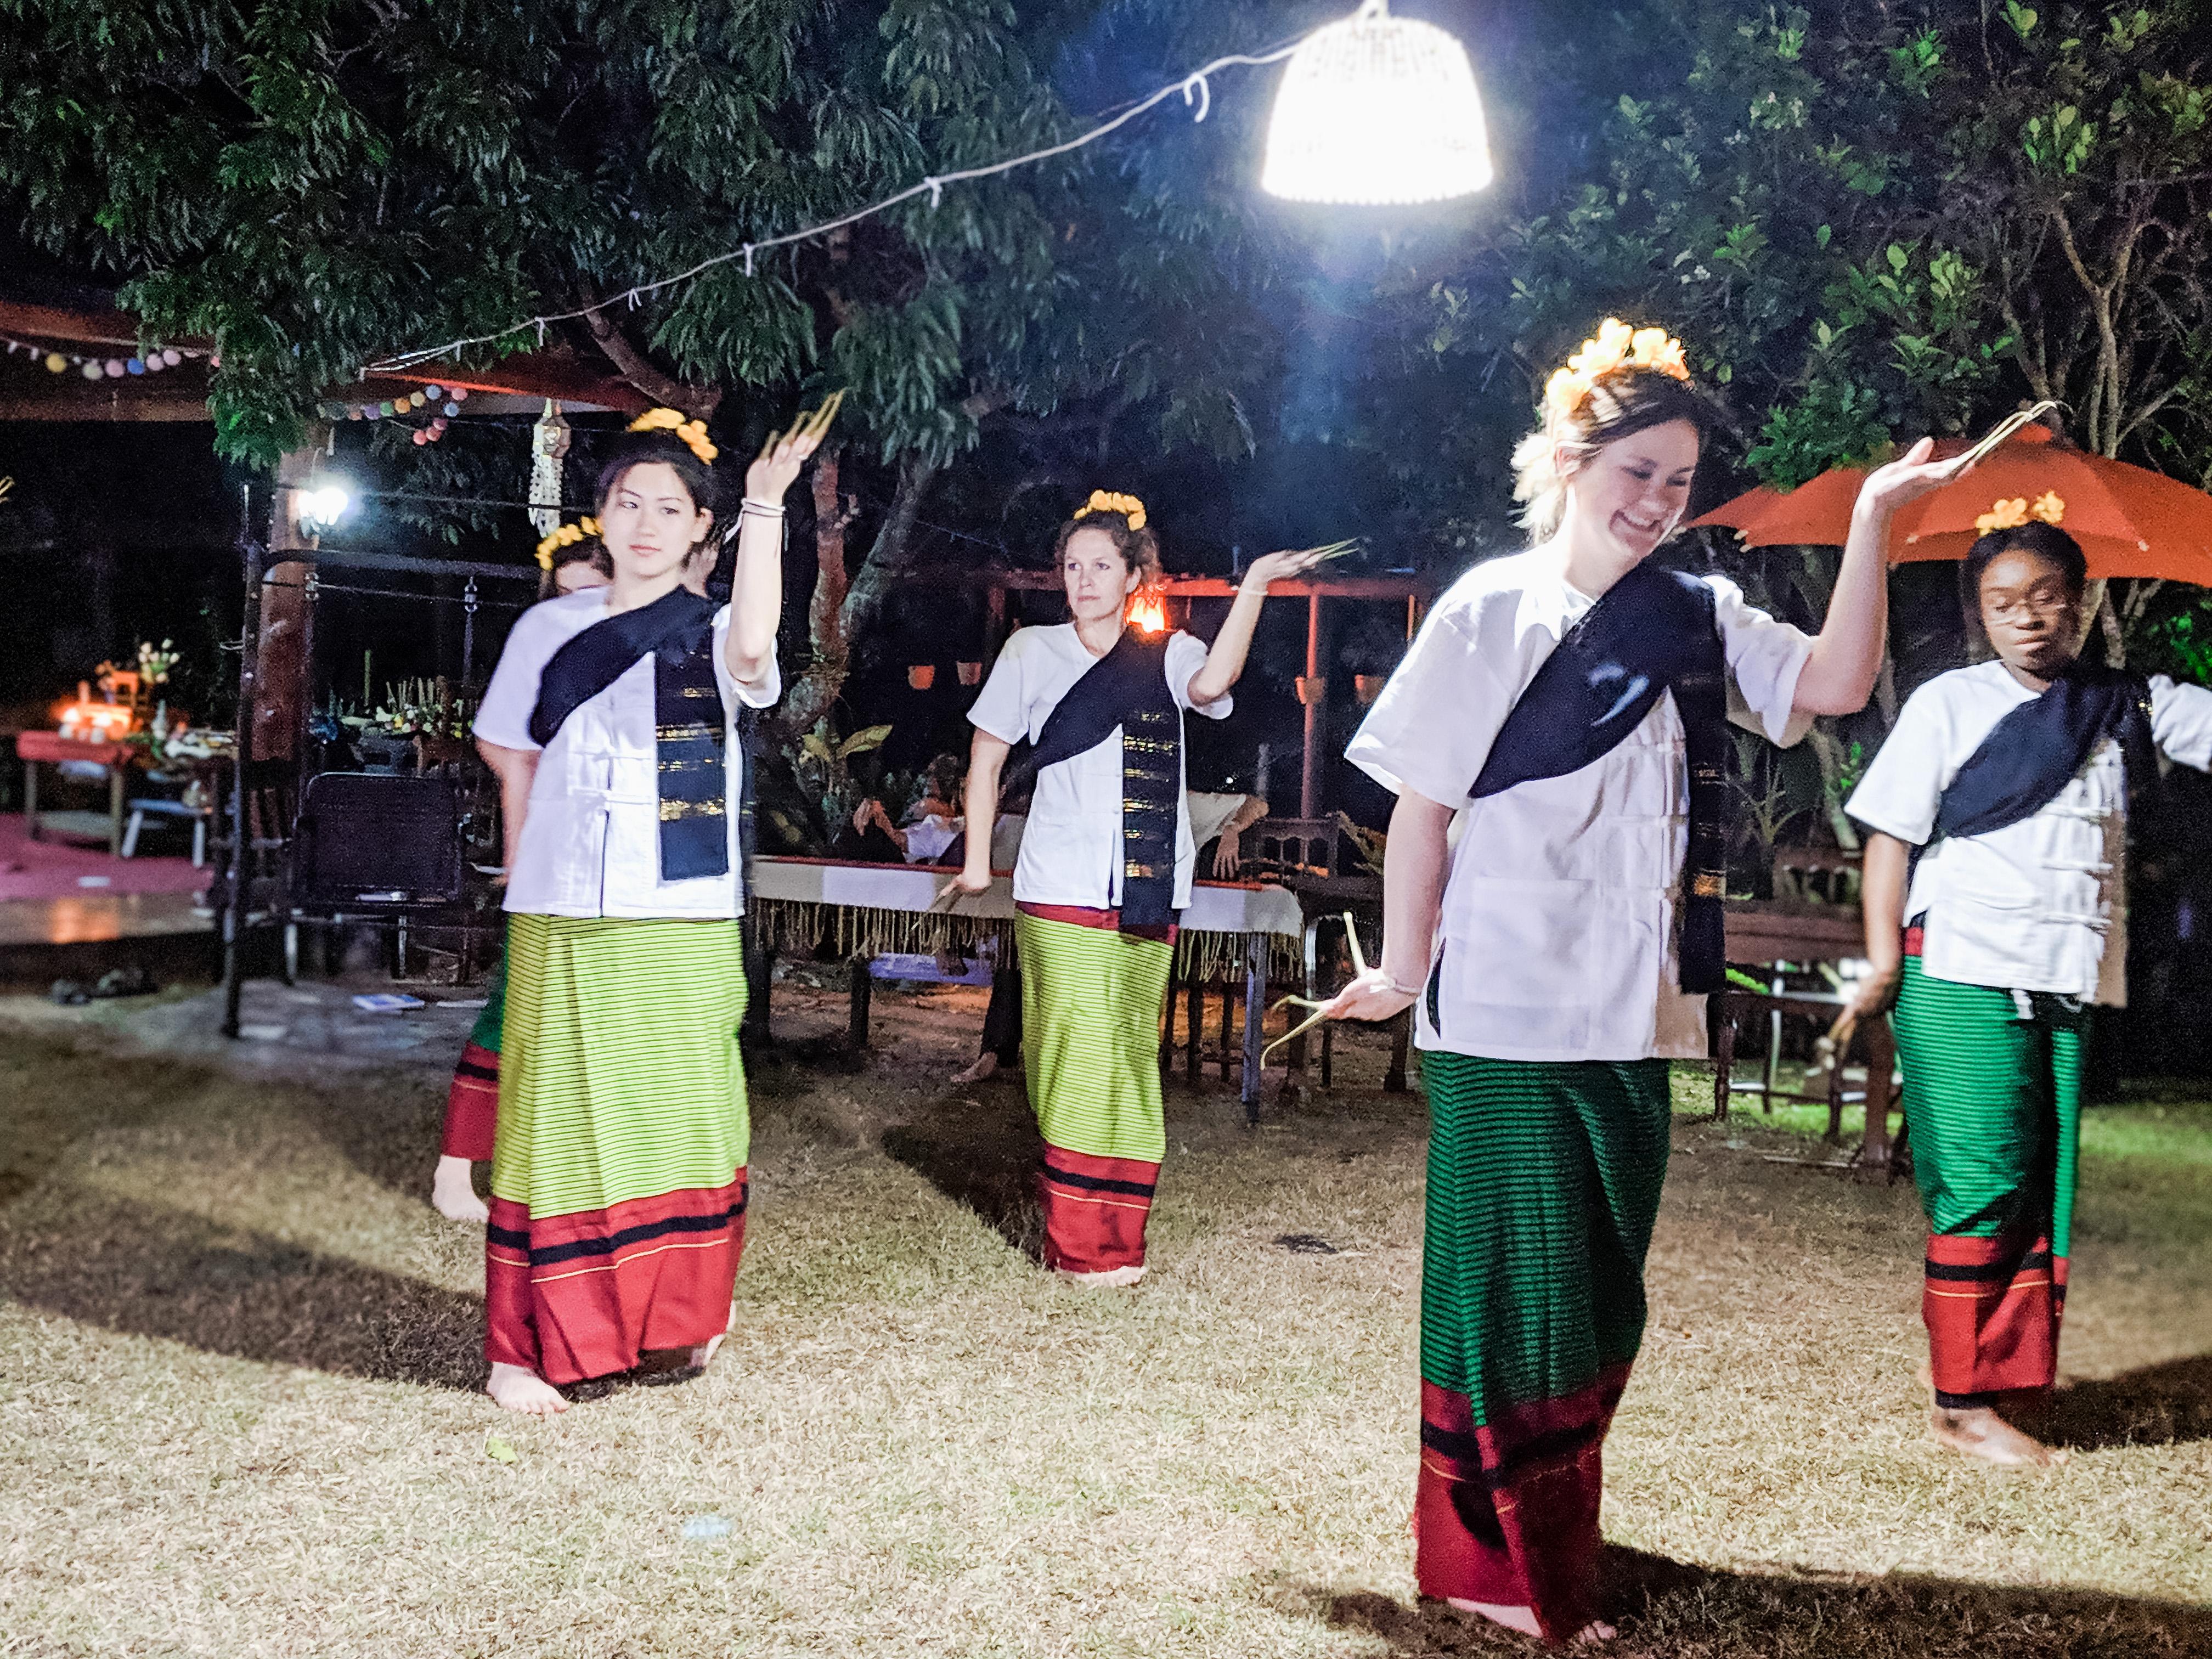 Gap Year Program - Carpe Diem Education | Southeast Asia Semester: Human Rights & Cultural Exchange  4